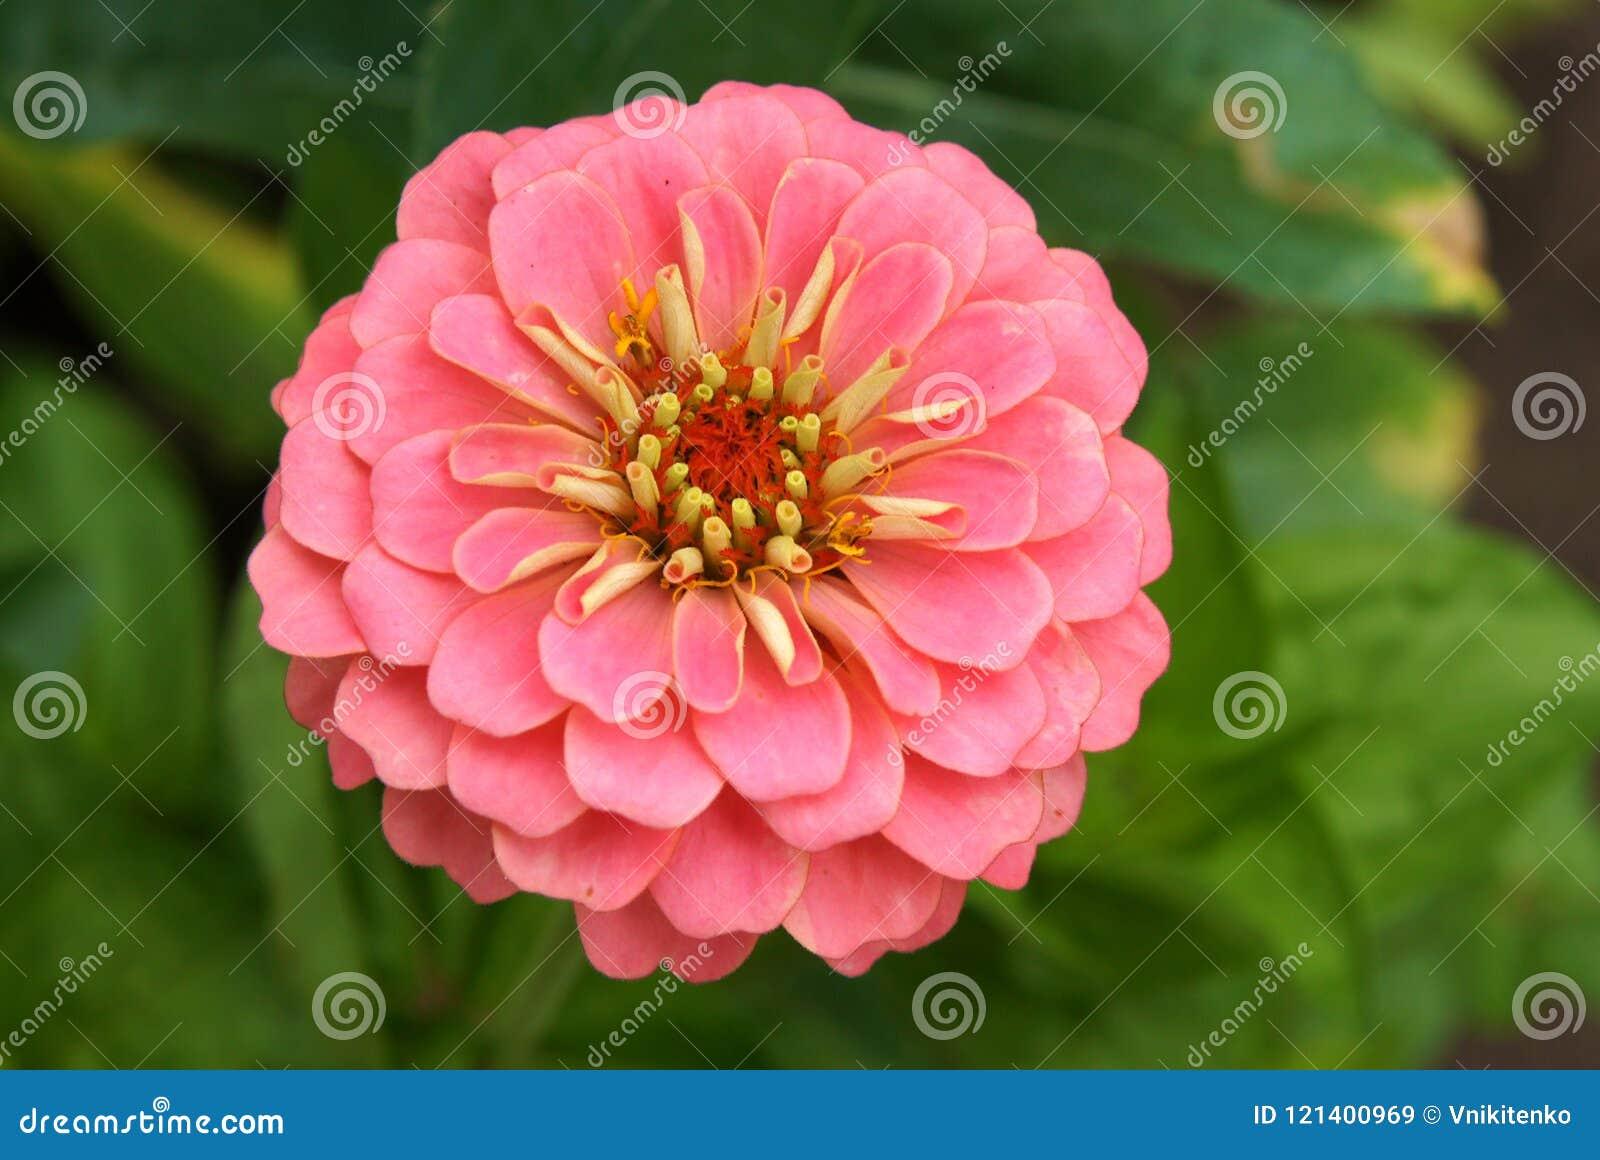 Close up of a zinnia flower